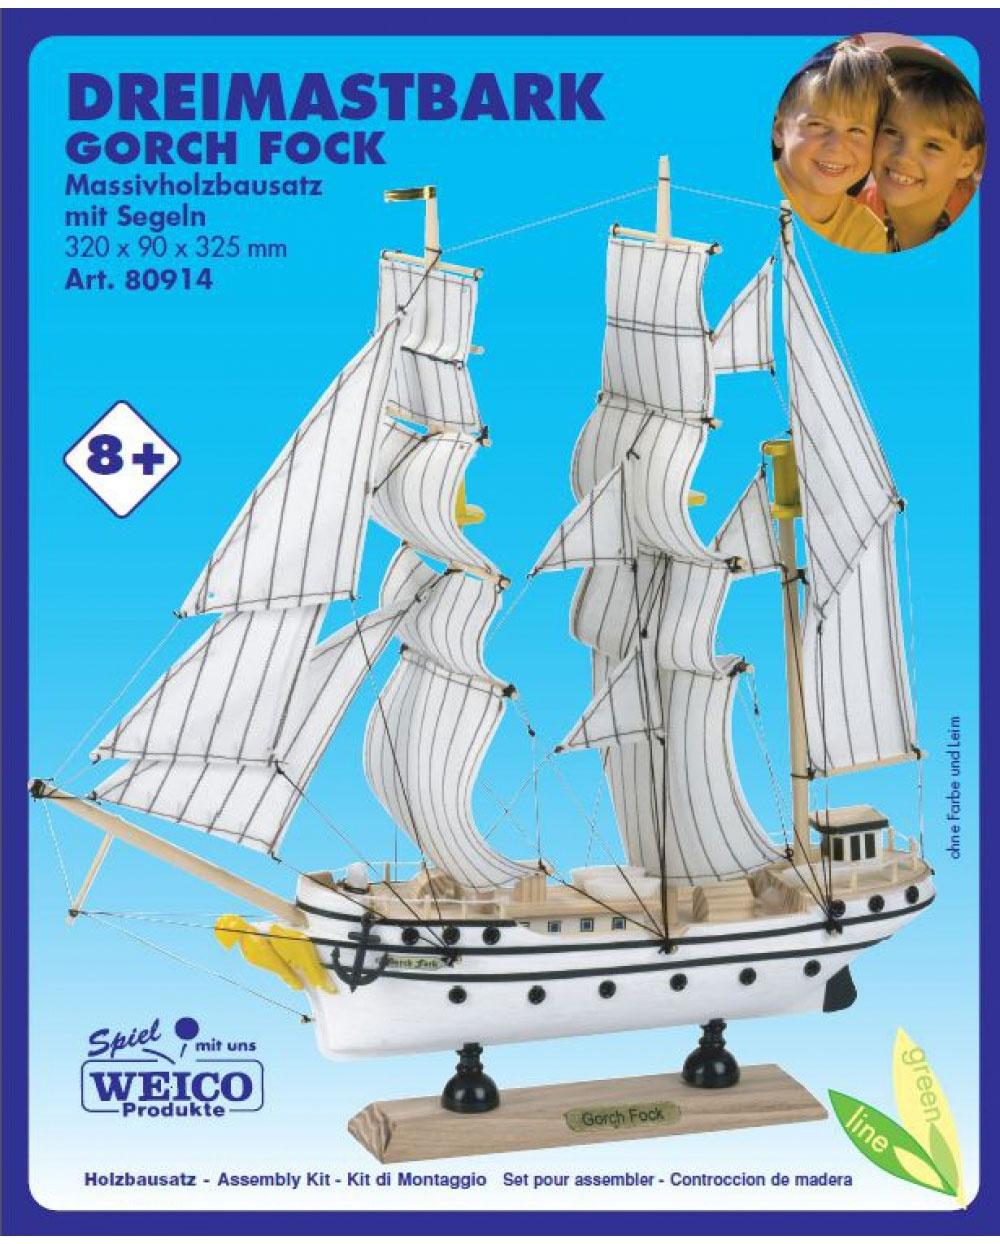 Holzbausatz Dreimastbark Gorch Fock Massivholz 320x90x325mm